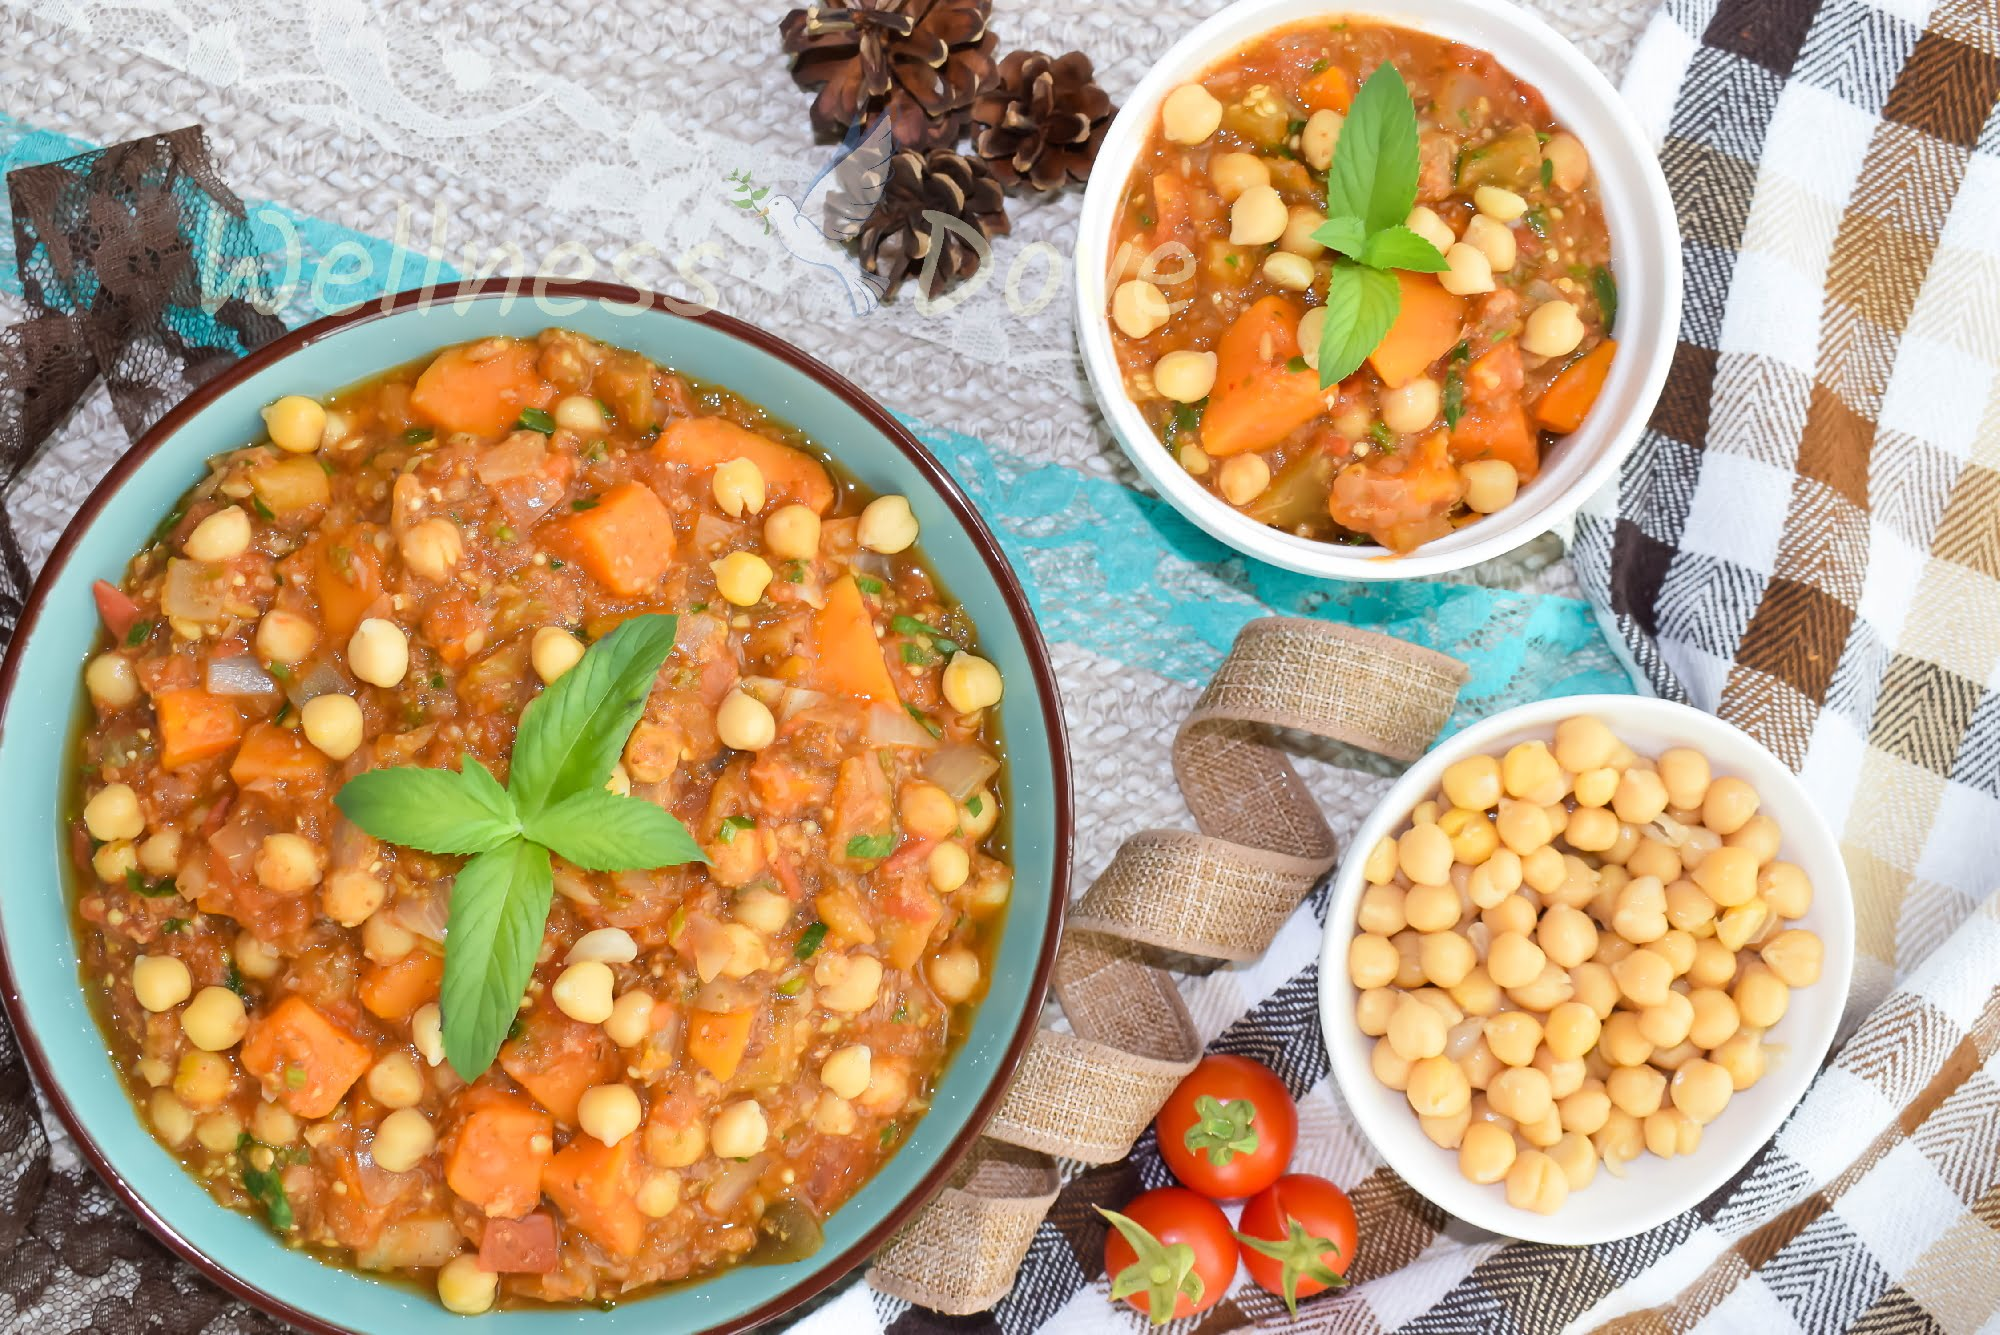 Chickpea stew with eggplant and sweet potato WellnessDove